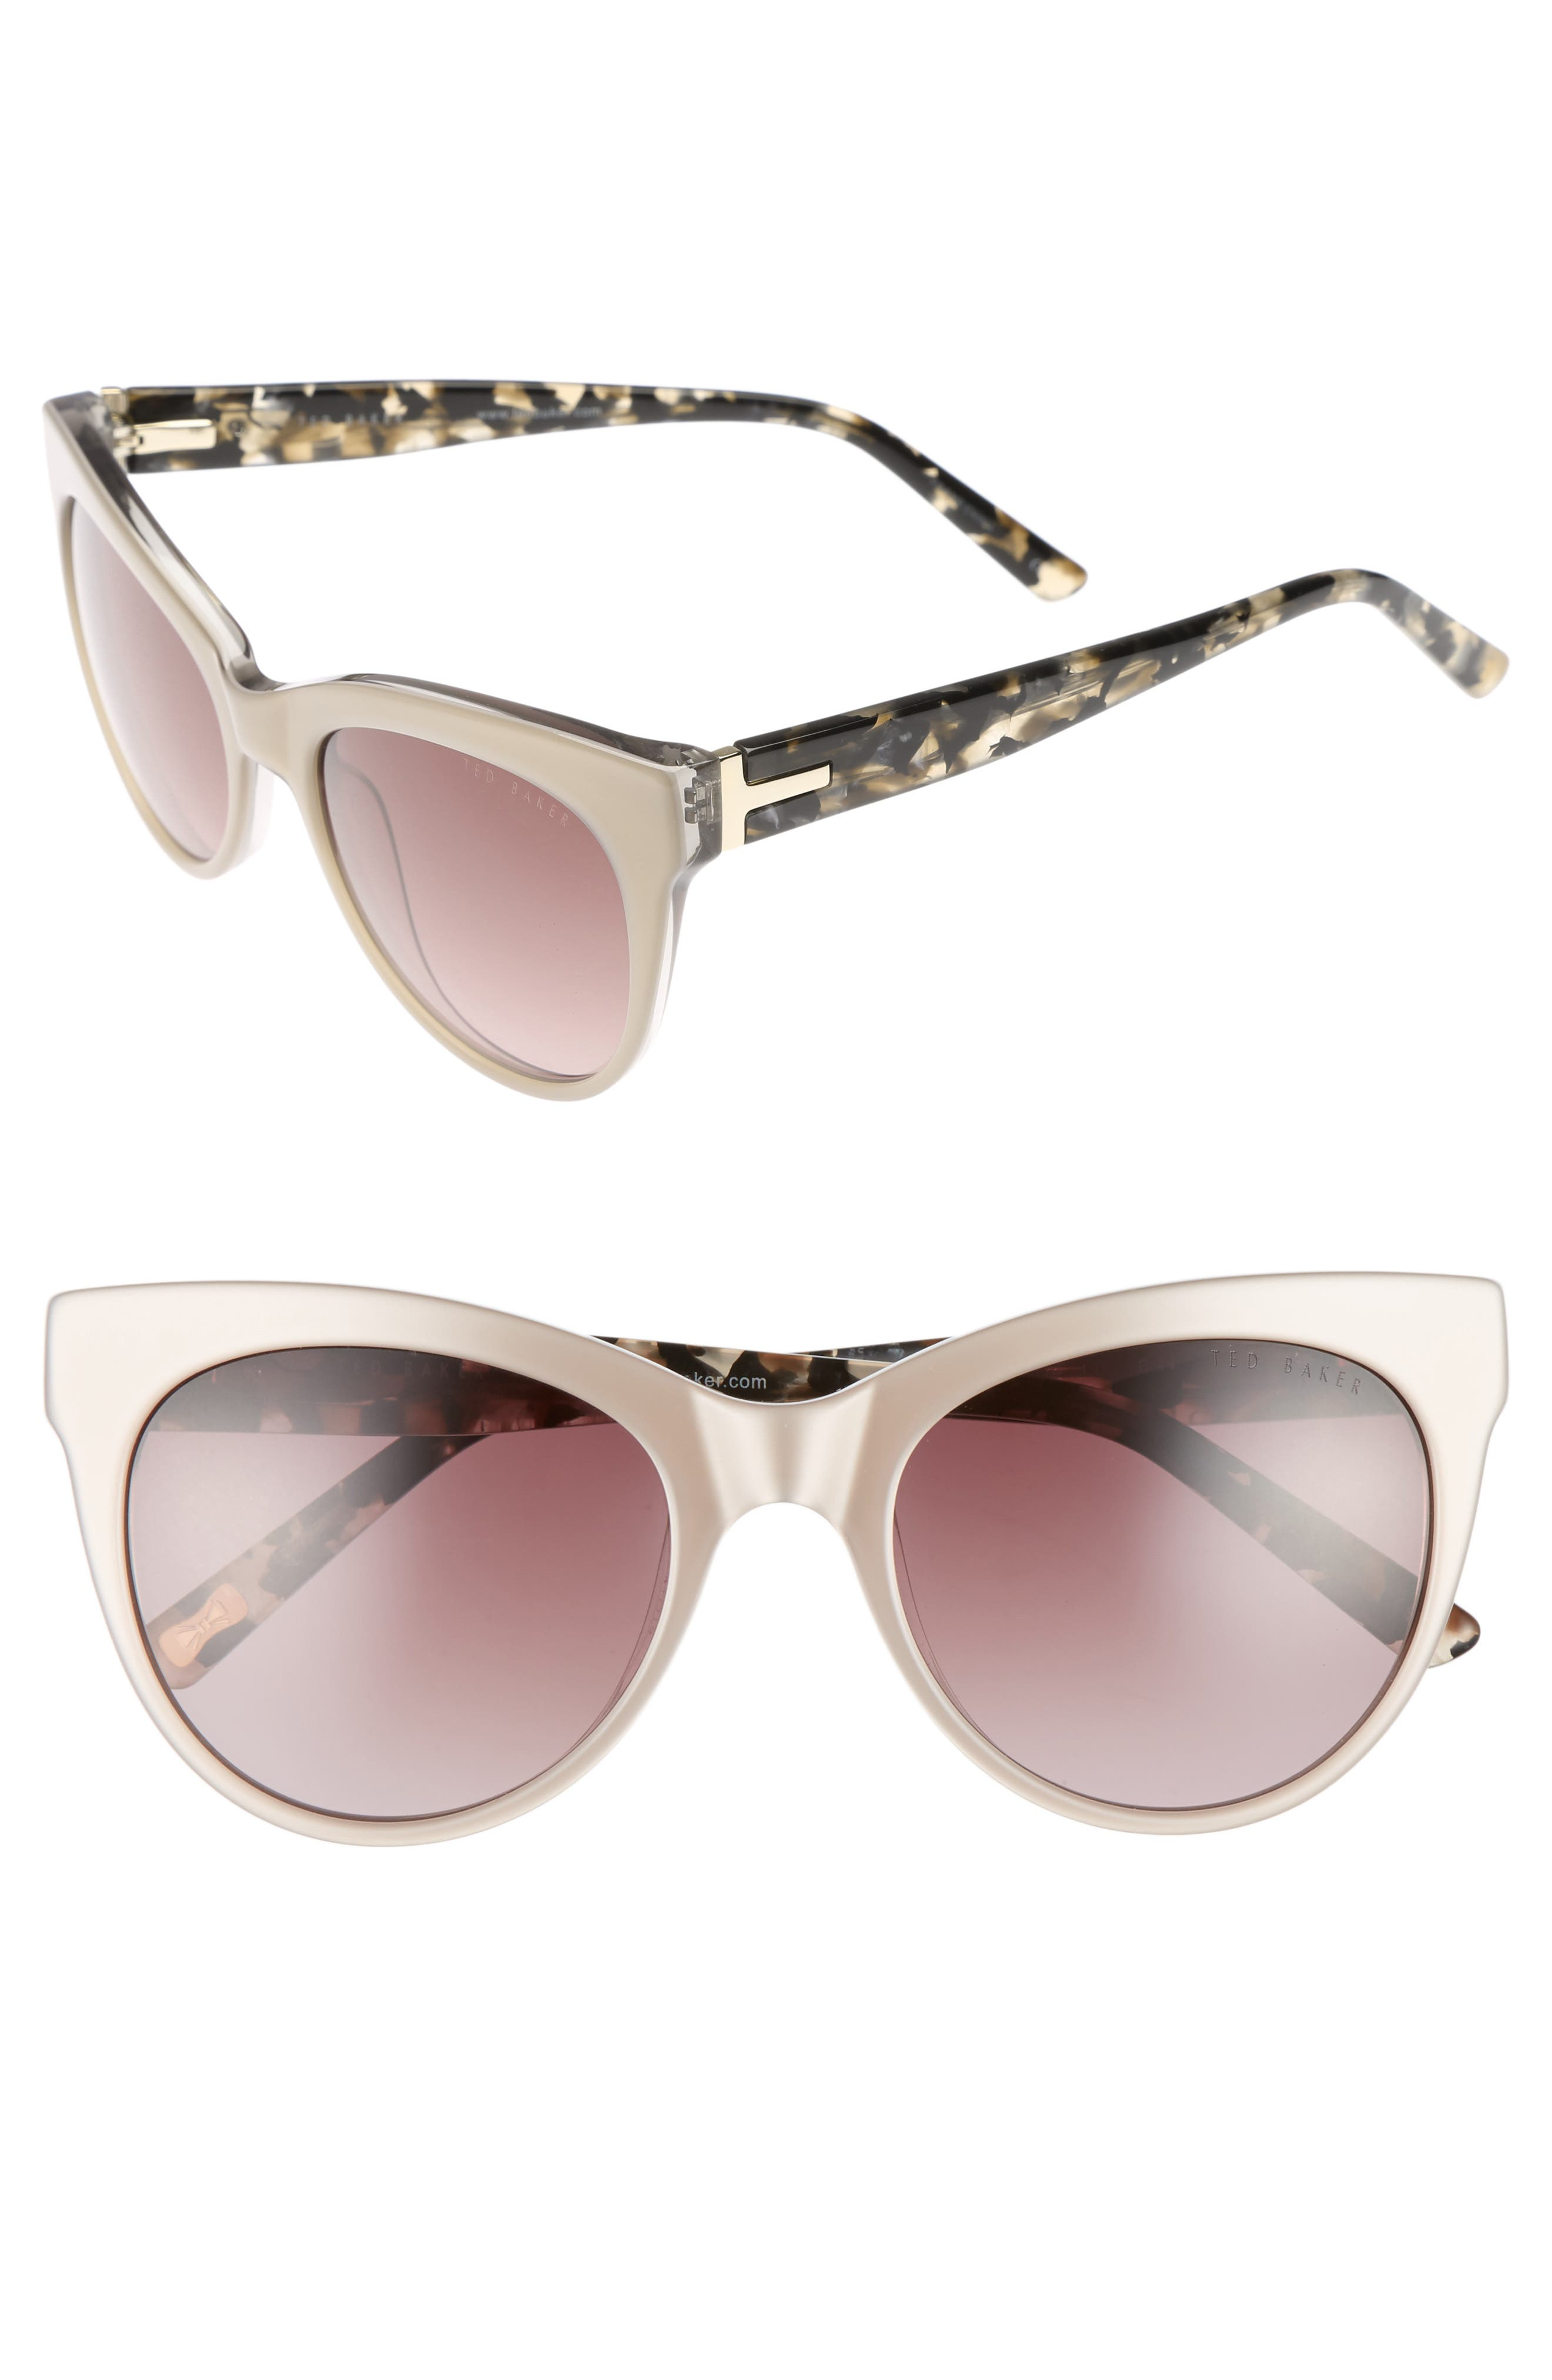 51mm Cat Eye Sunglasses,                         Main,                         color,